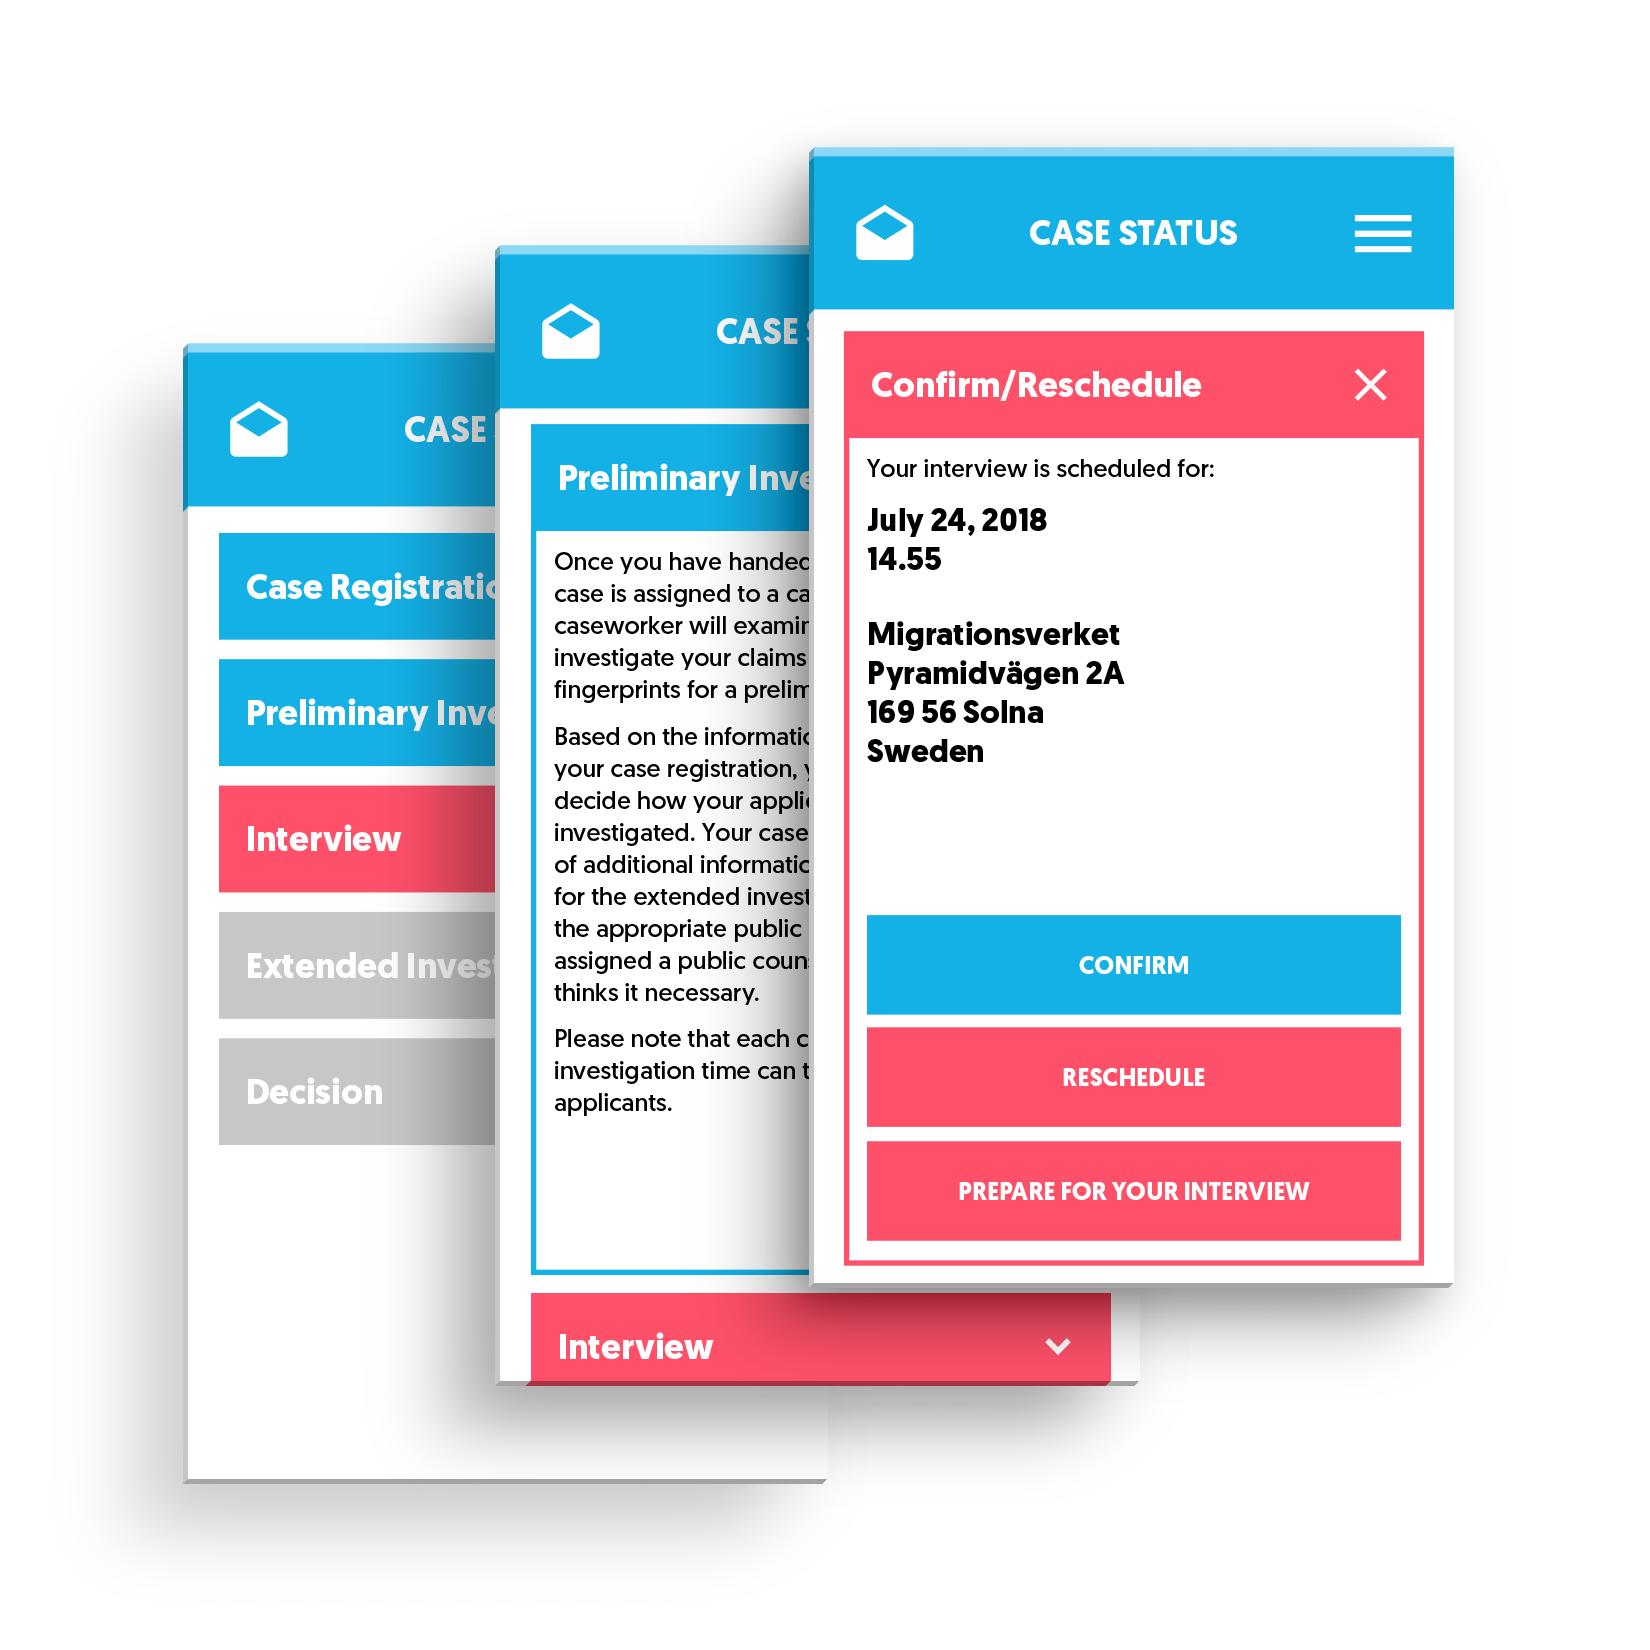 CaseStatus-MobileV2-web.png